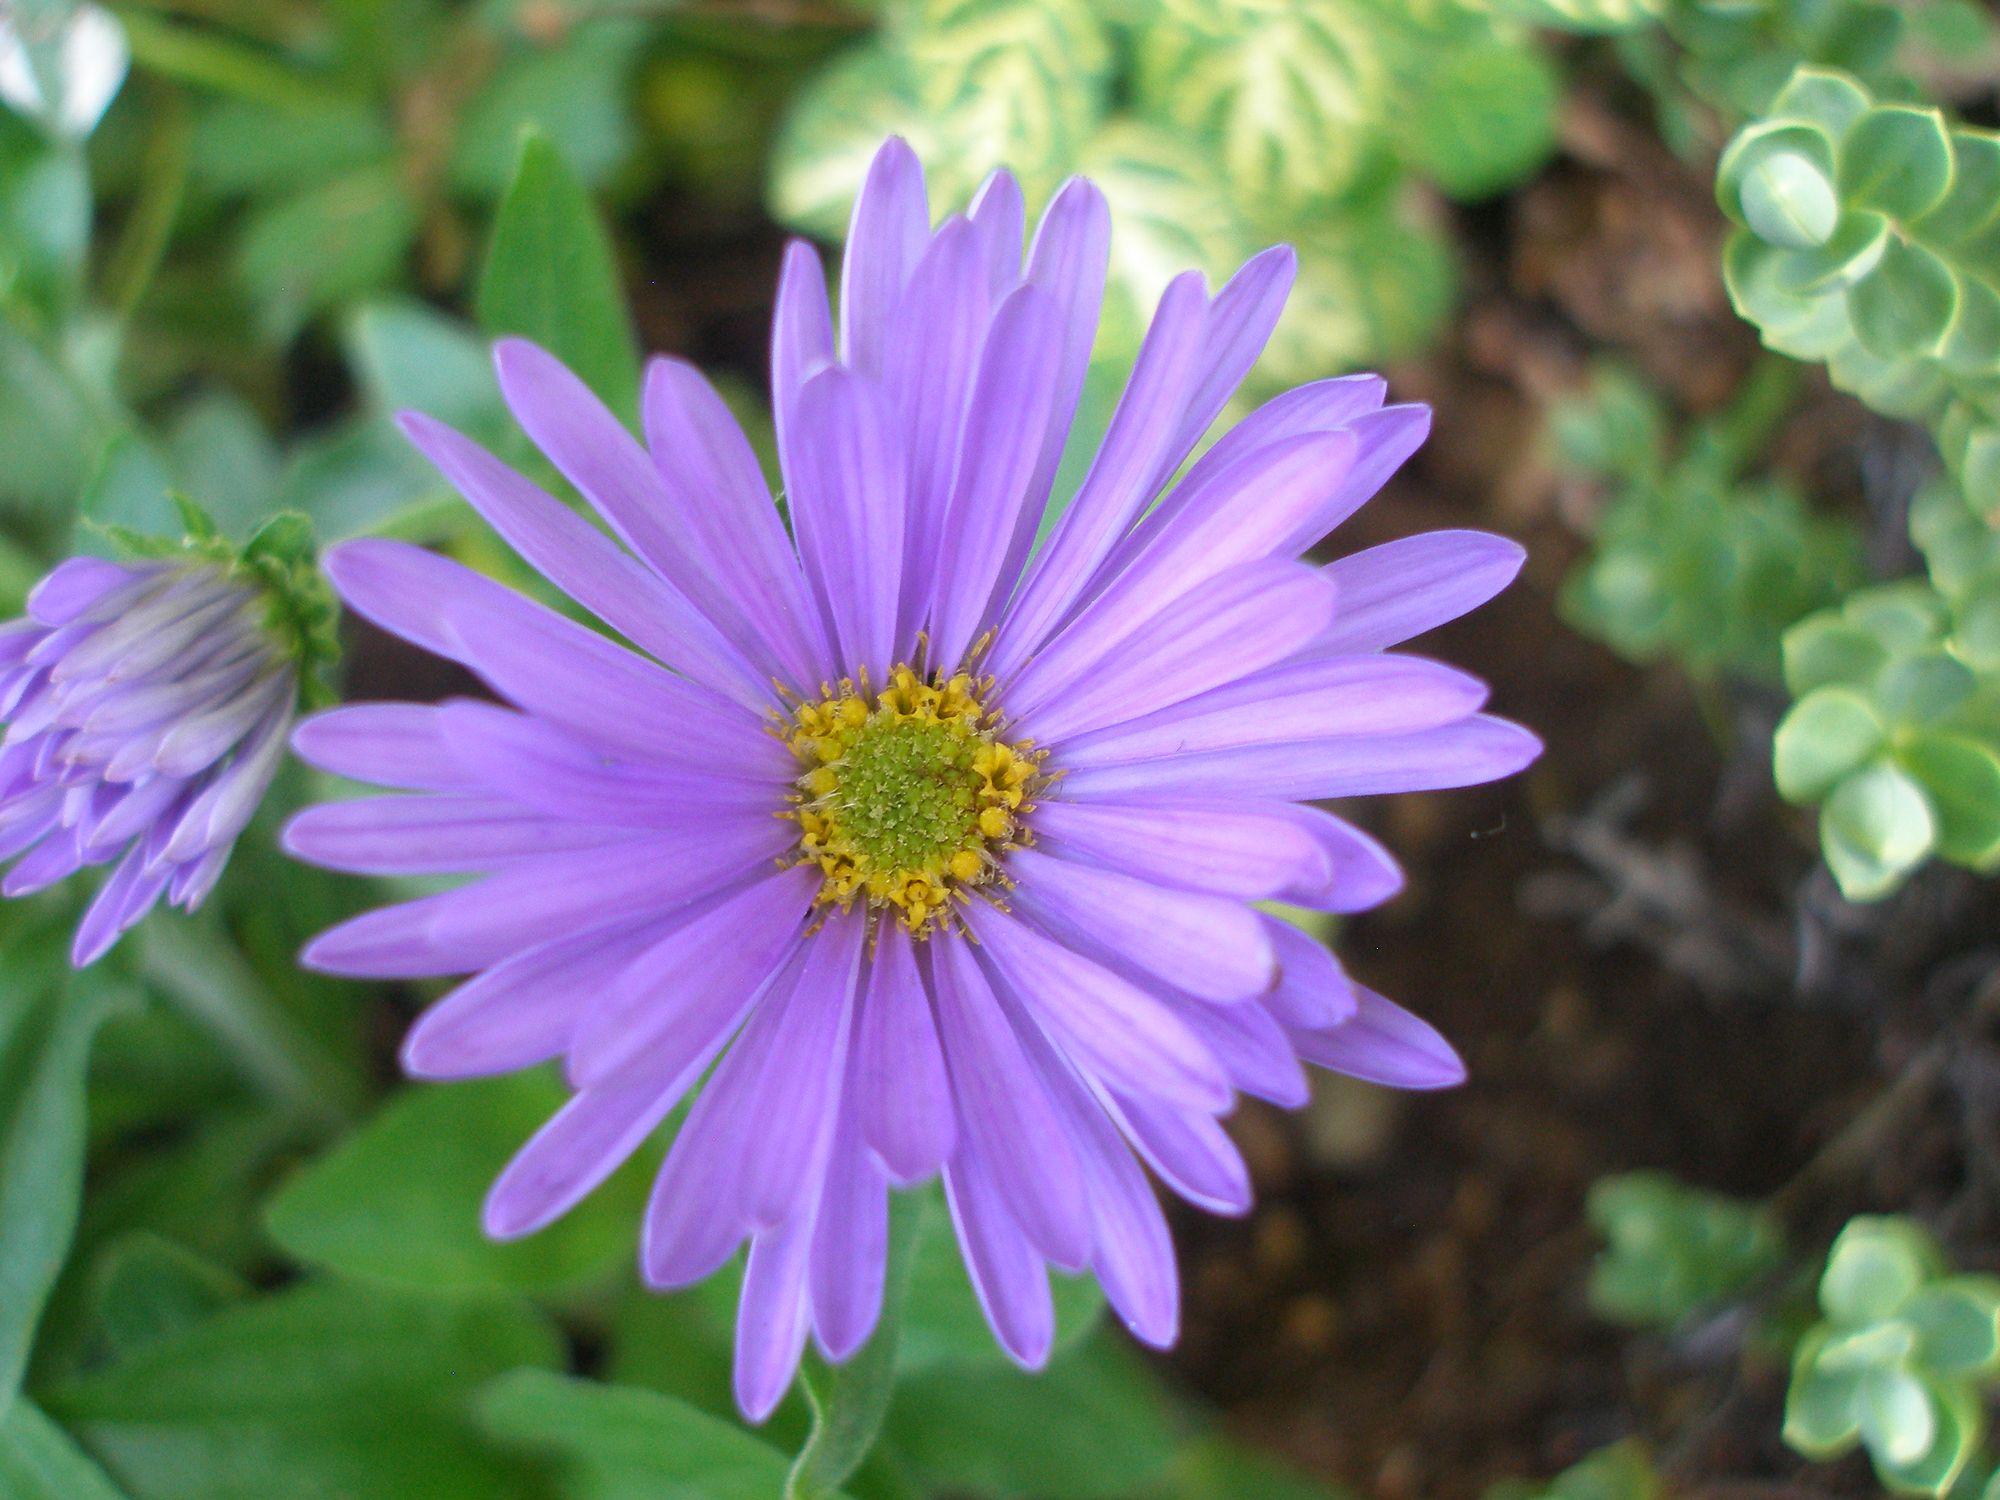 Alpinis astras (Symphyotrichum alpinus, syn. Aster alpinus)